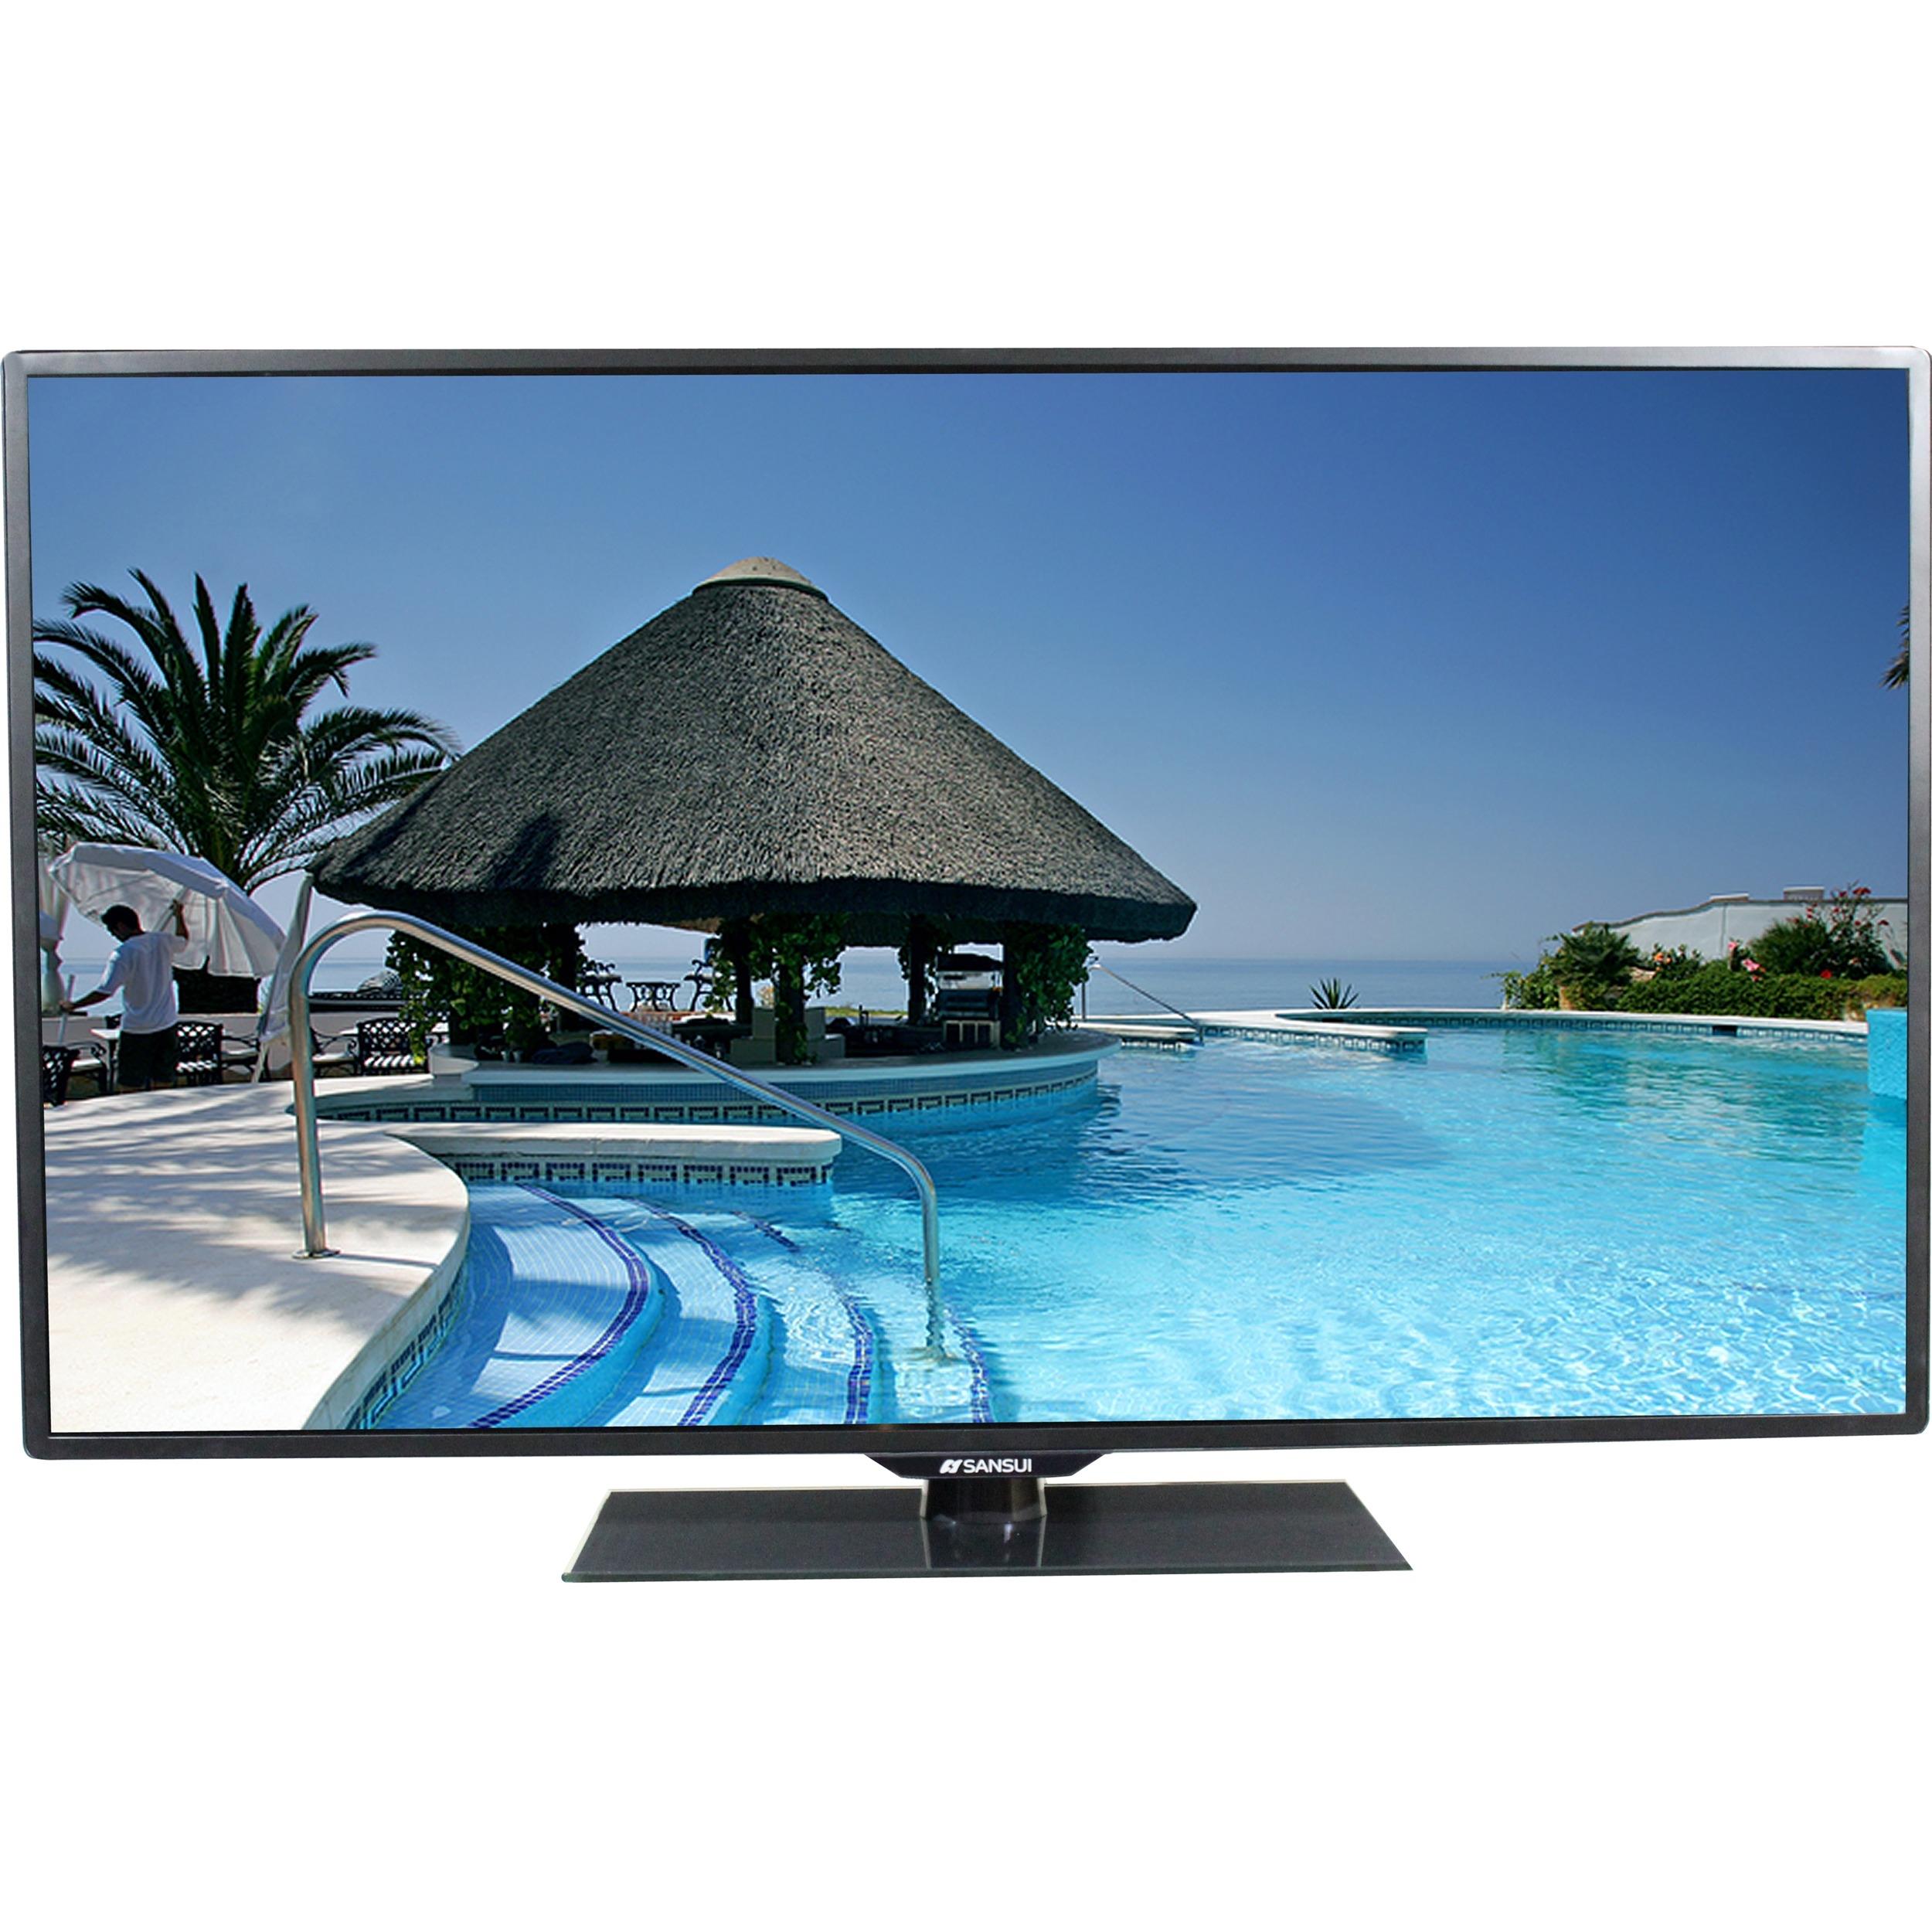 Sansui 50in LED FULL HD 1080P TV